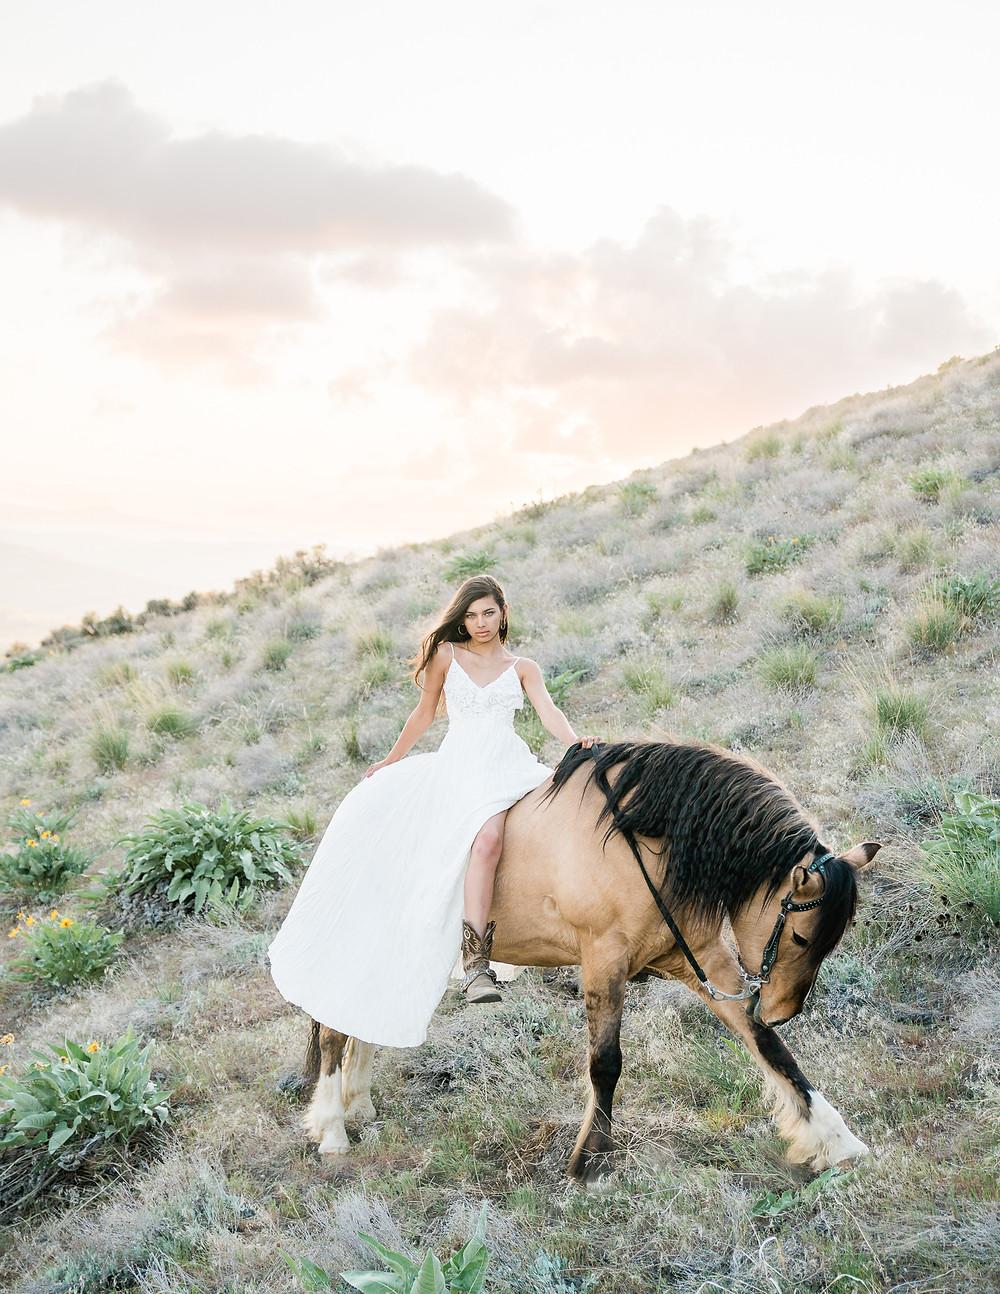 Soli wearing a long white dress, draped over Bubba's back